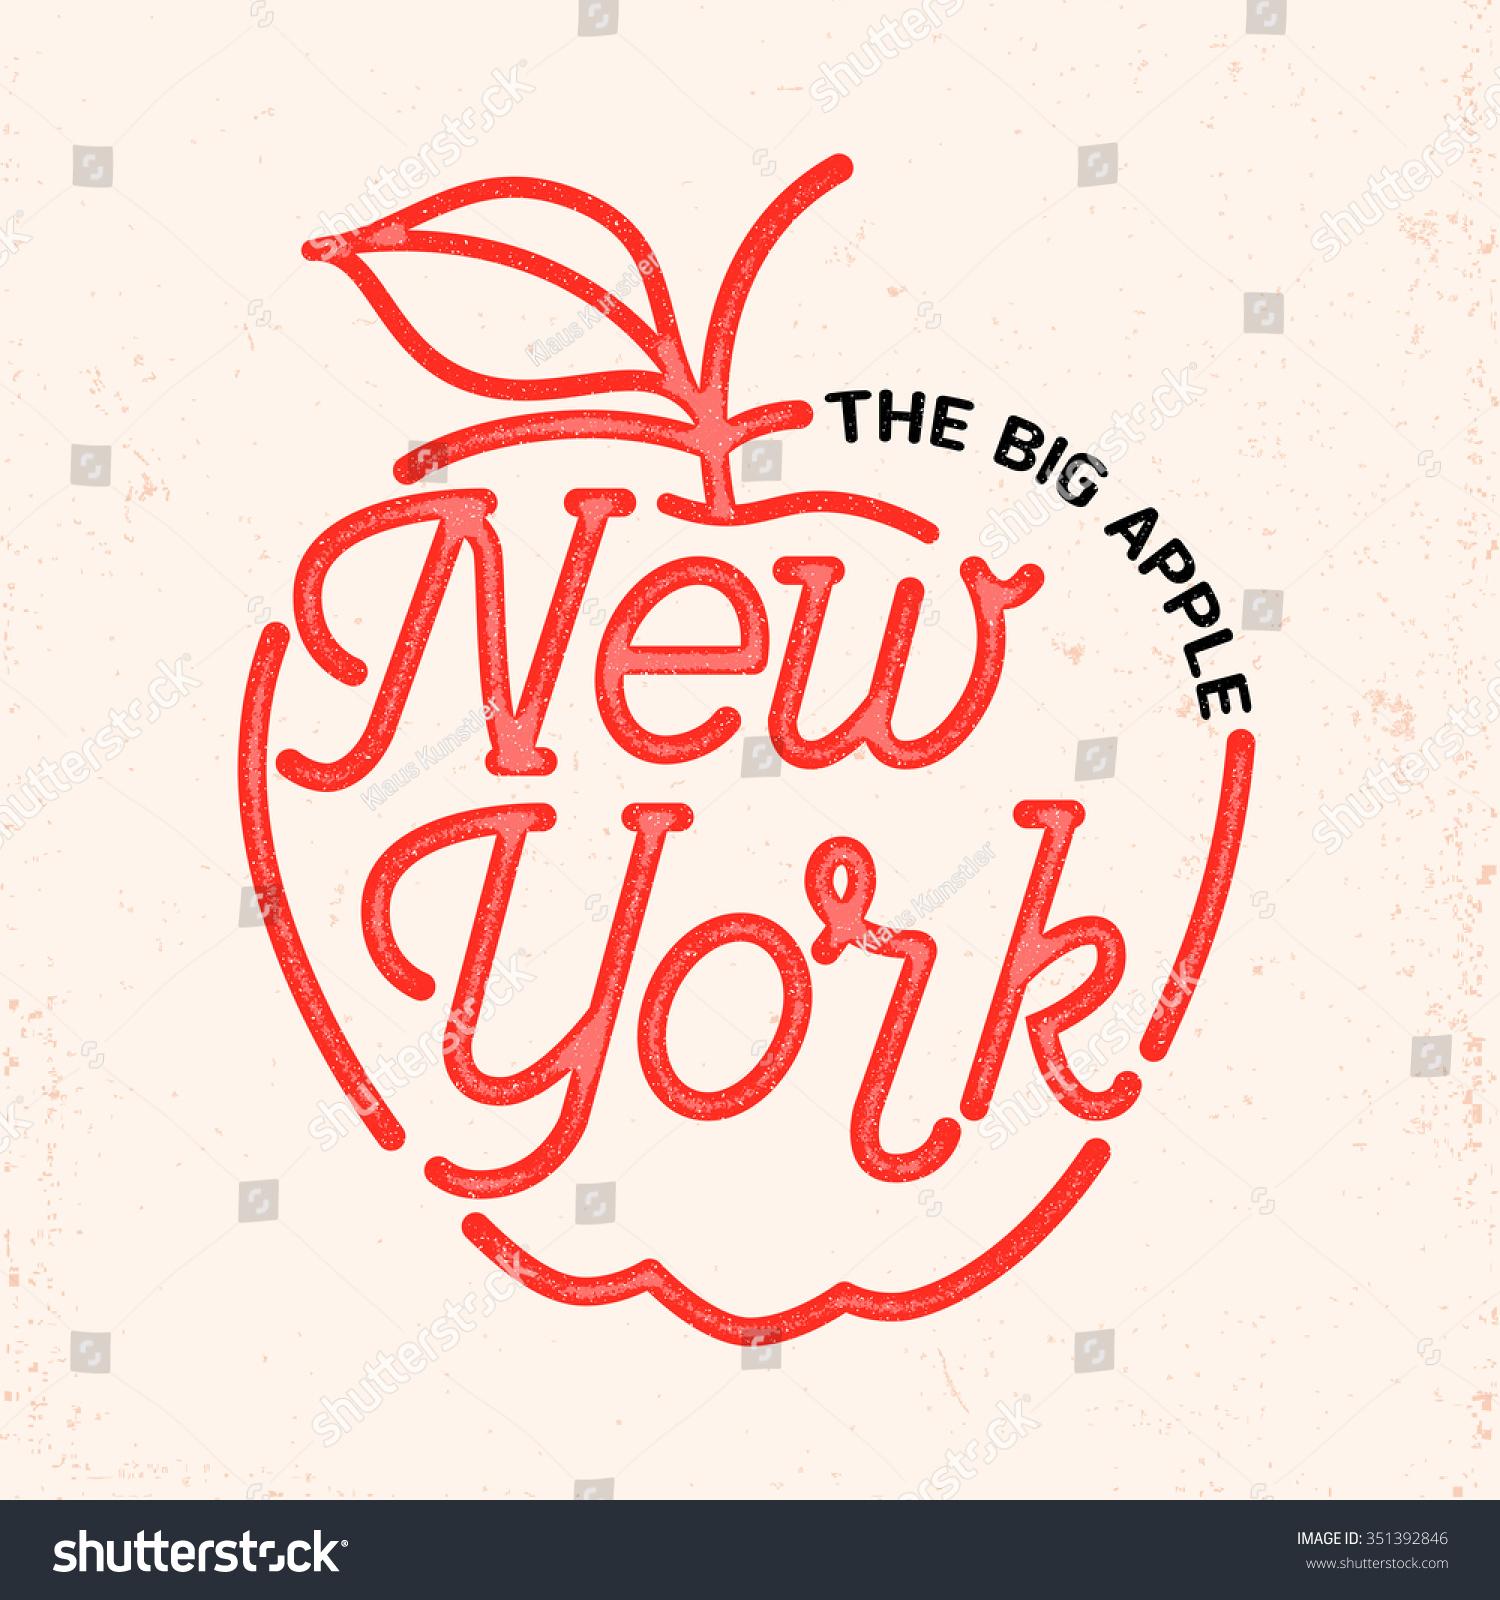 New York City Typography Line Art Design For Apparel T Shirt Print